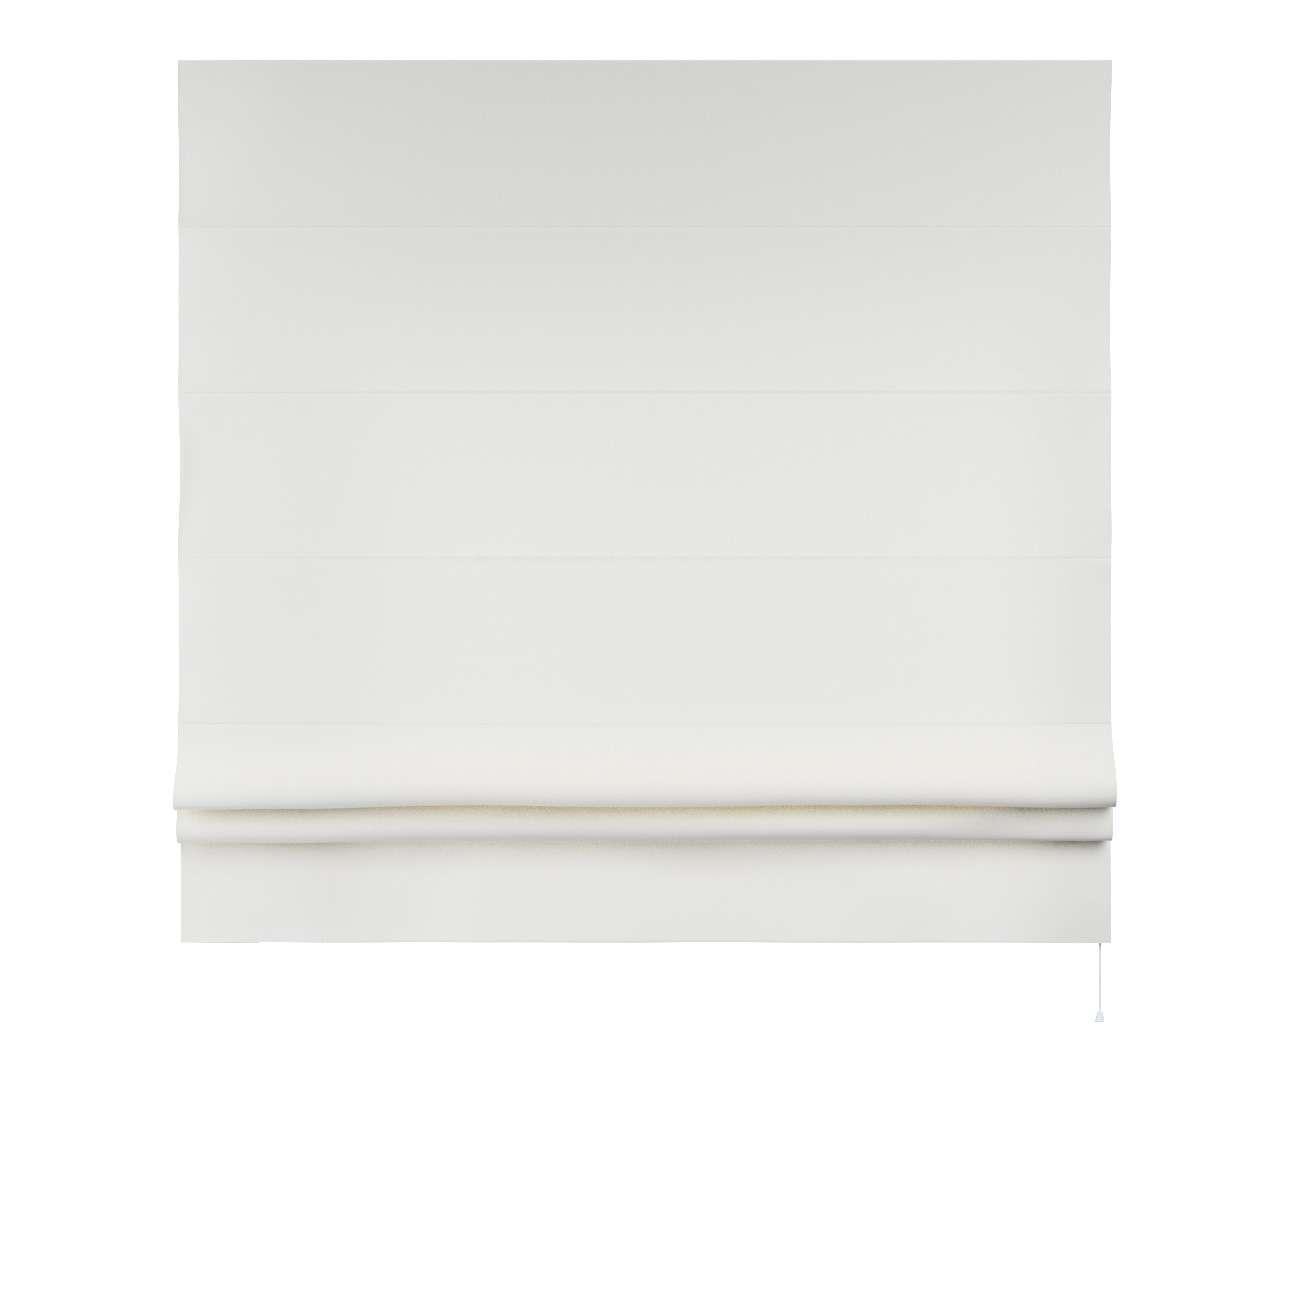 Raffrollo Padva von der Kollektion Cotton Panama, Stoff: 702-34